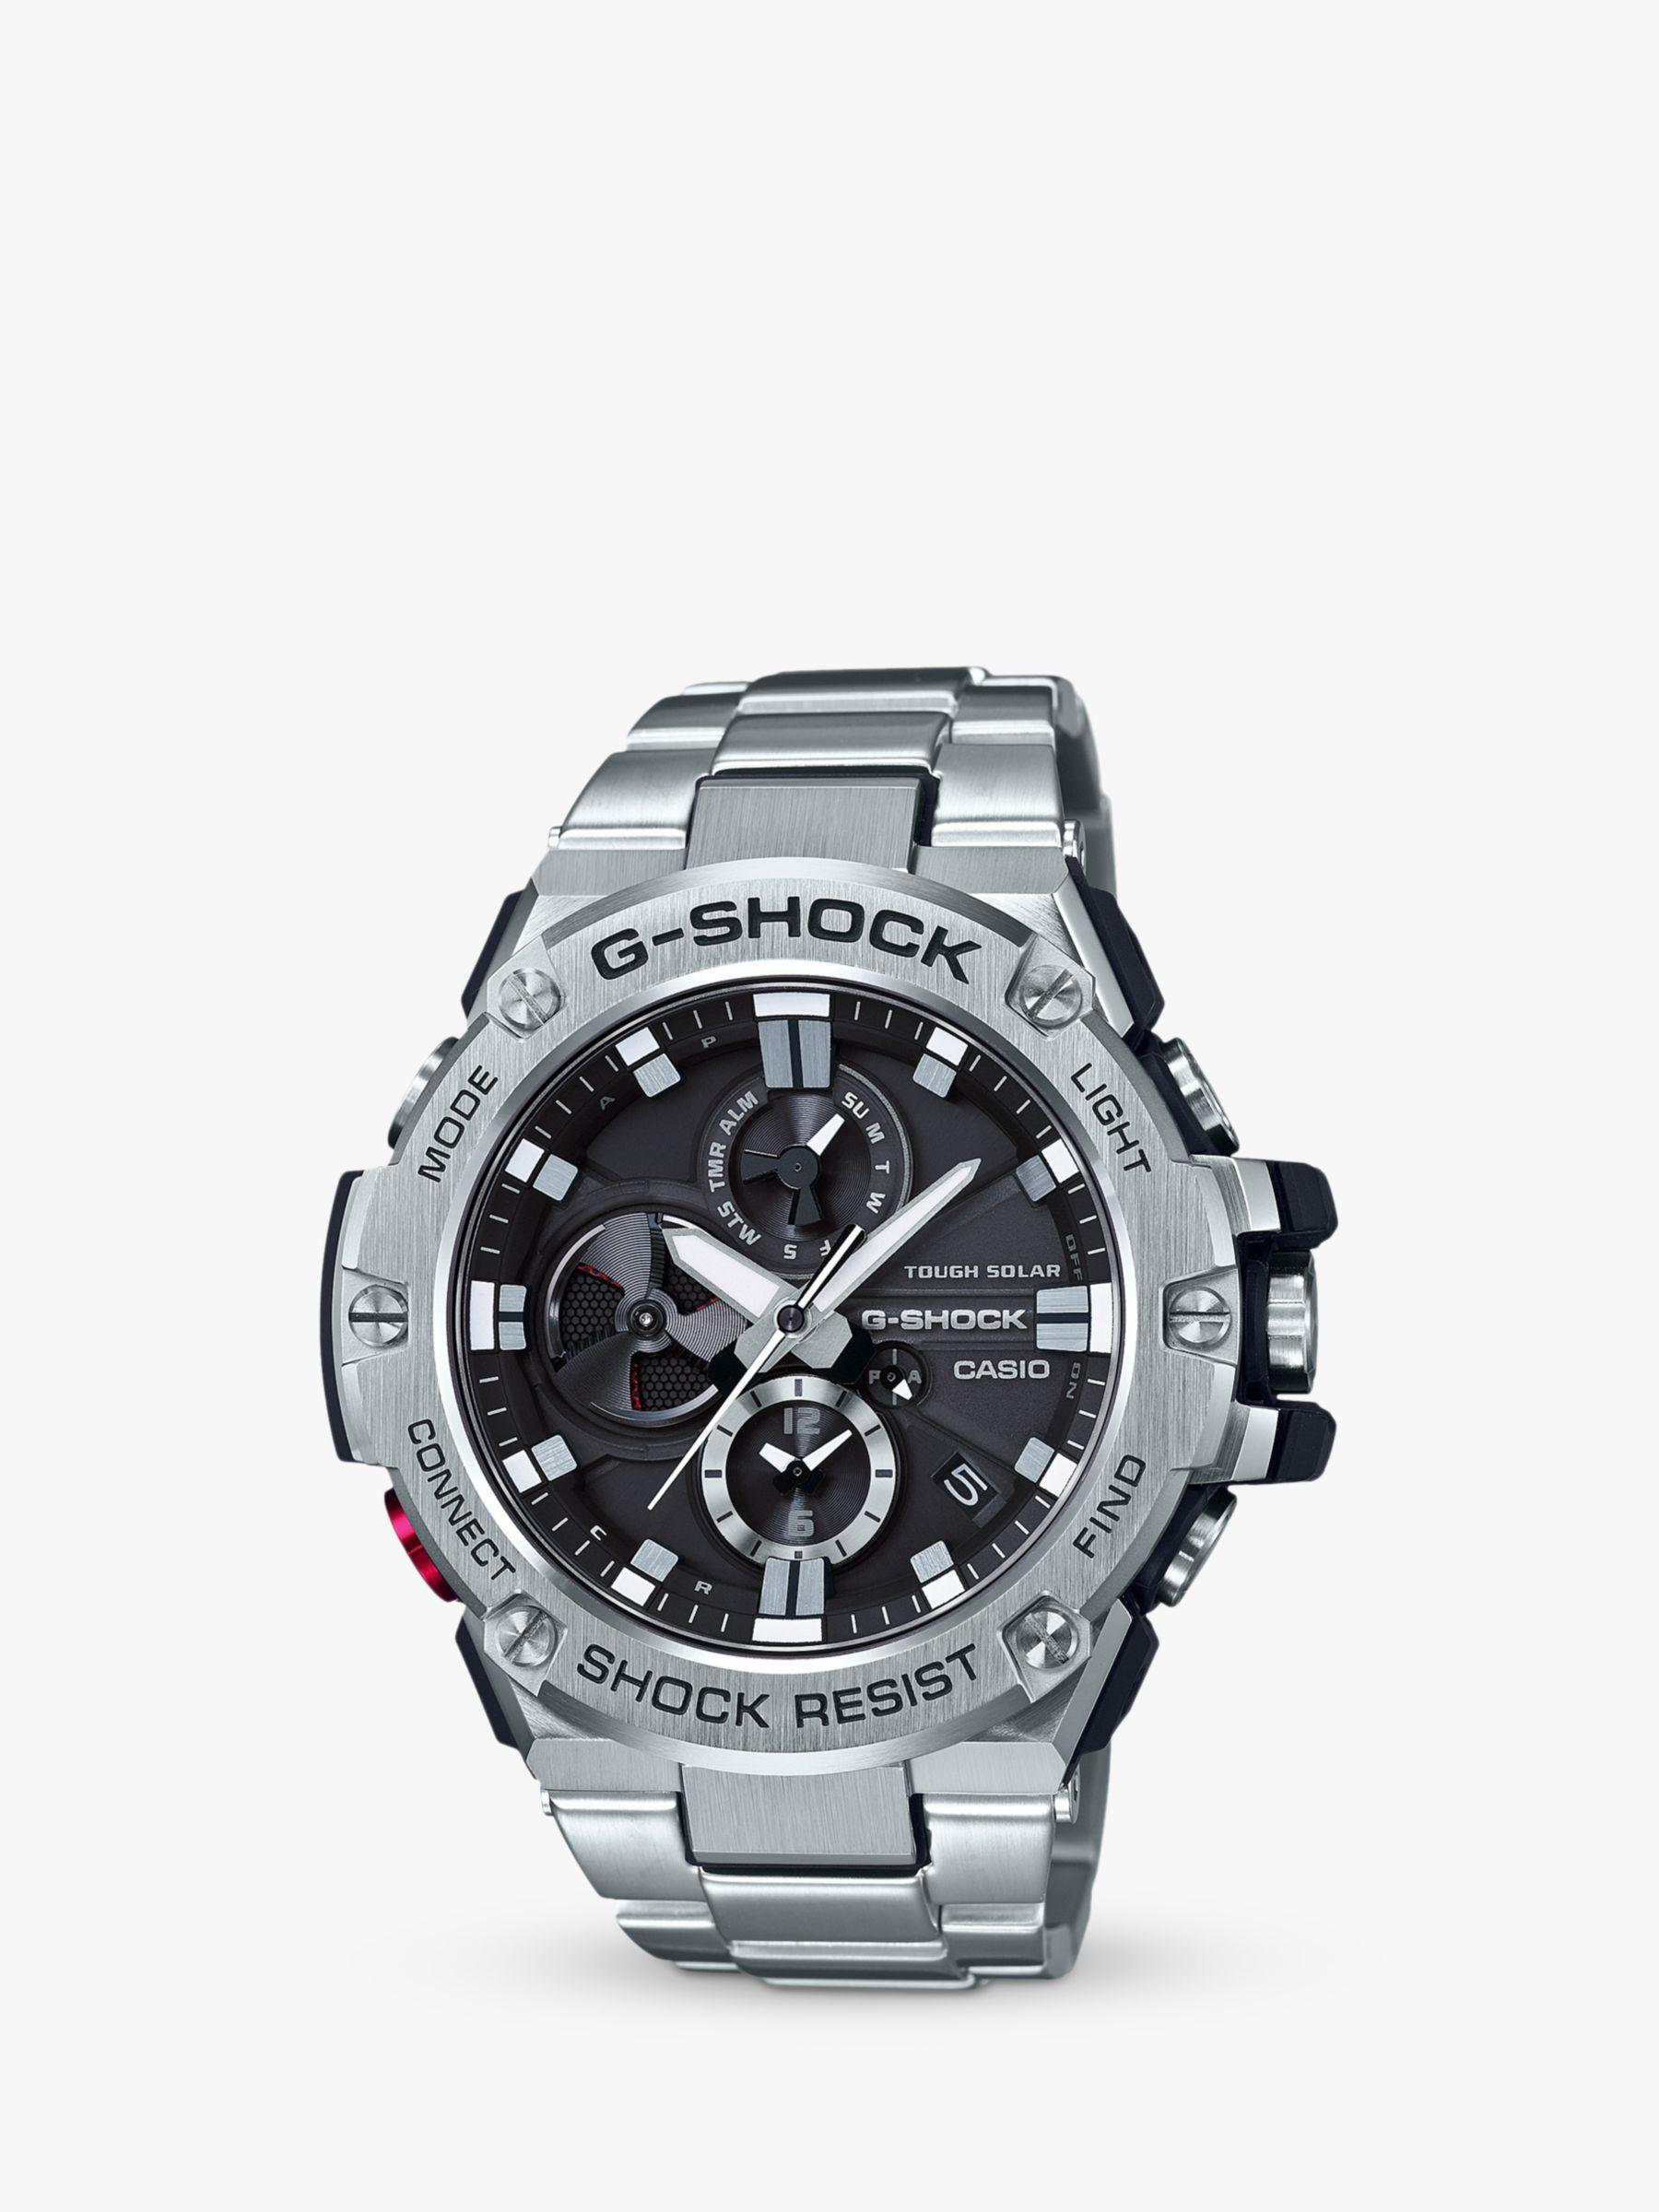 Casio Casio GST-B100D-1AER Men's G-Shock Chronograph Day Date Bracelet Strap Watch, Silver/Black